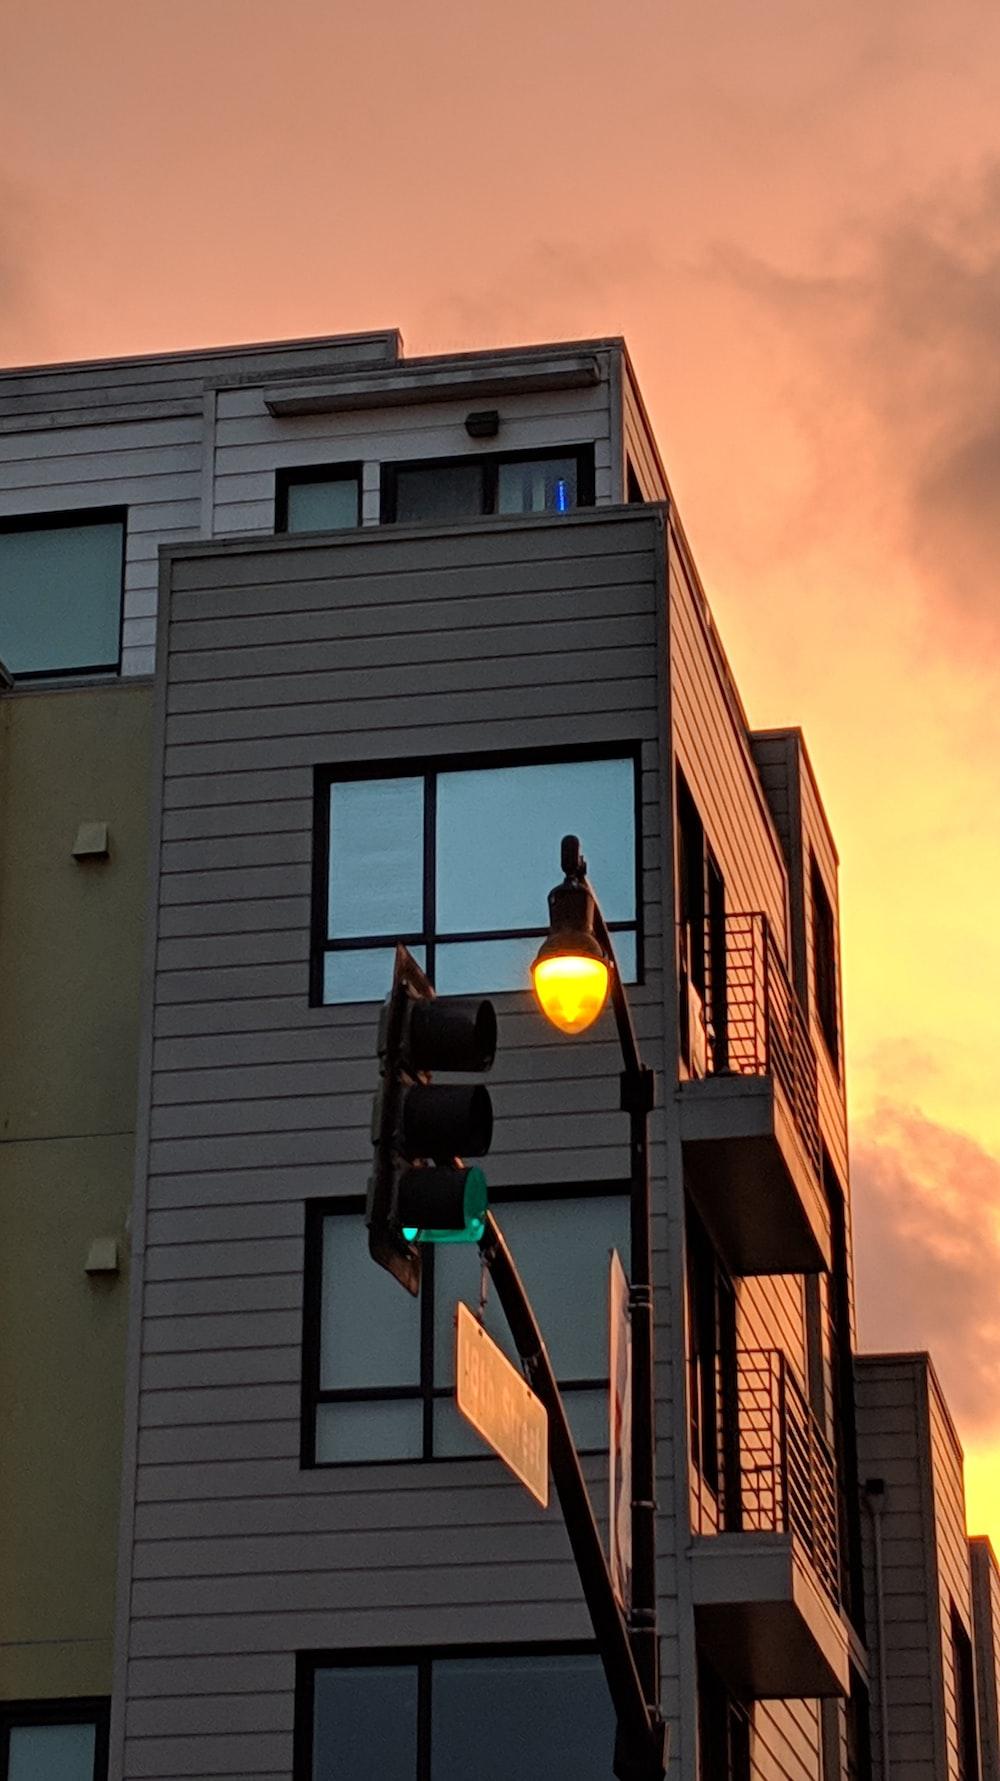 traffic lights near white building